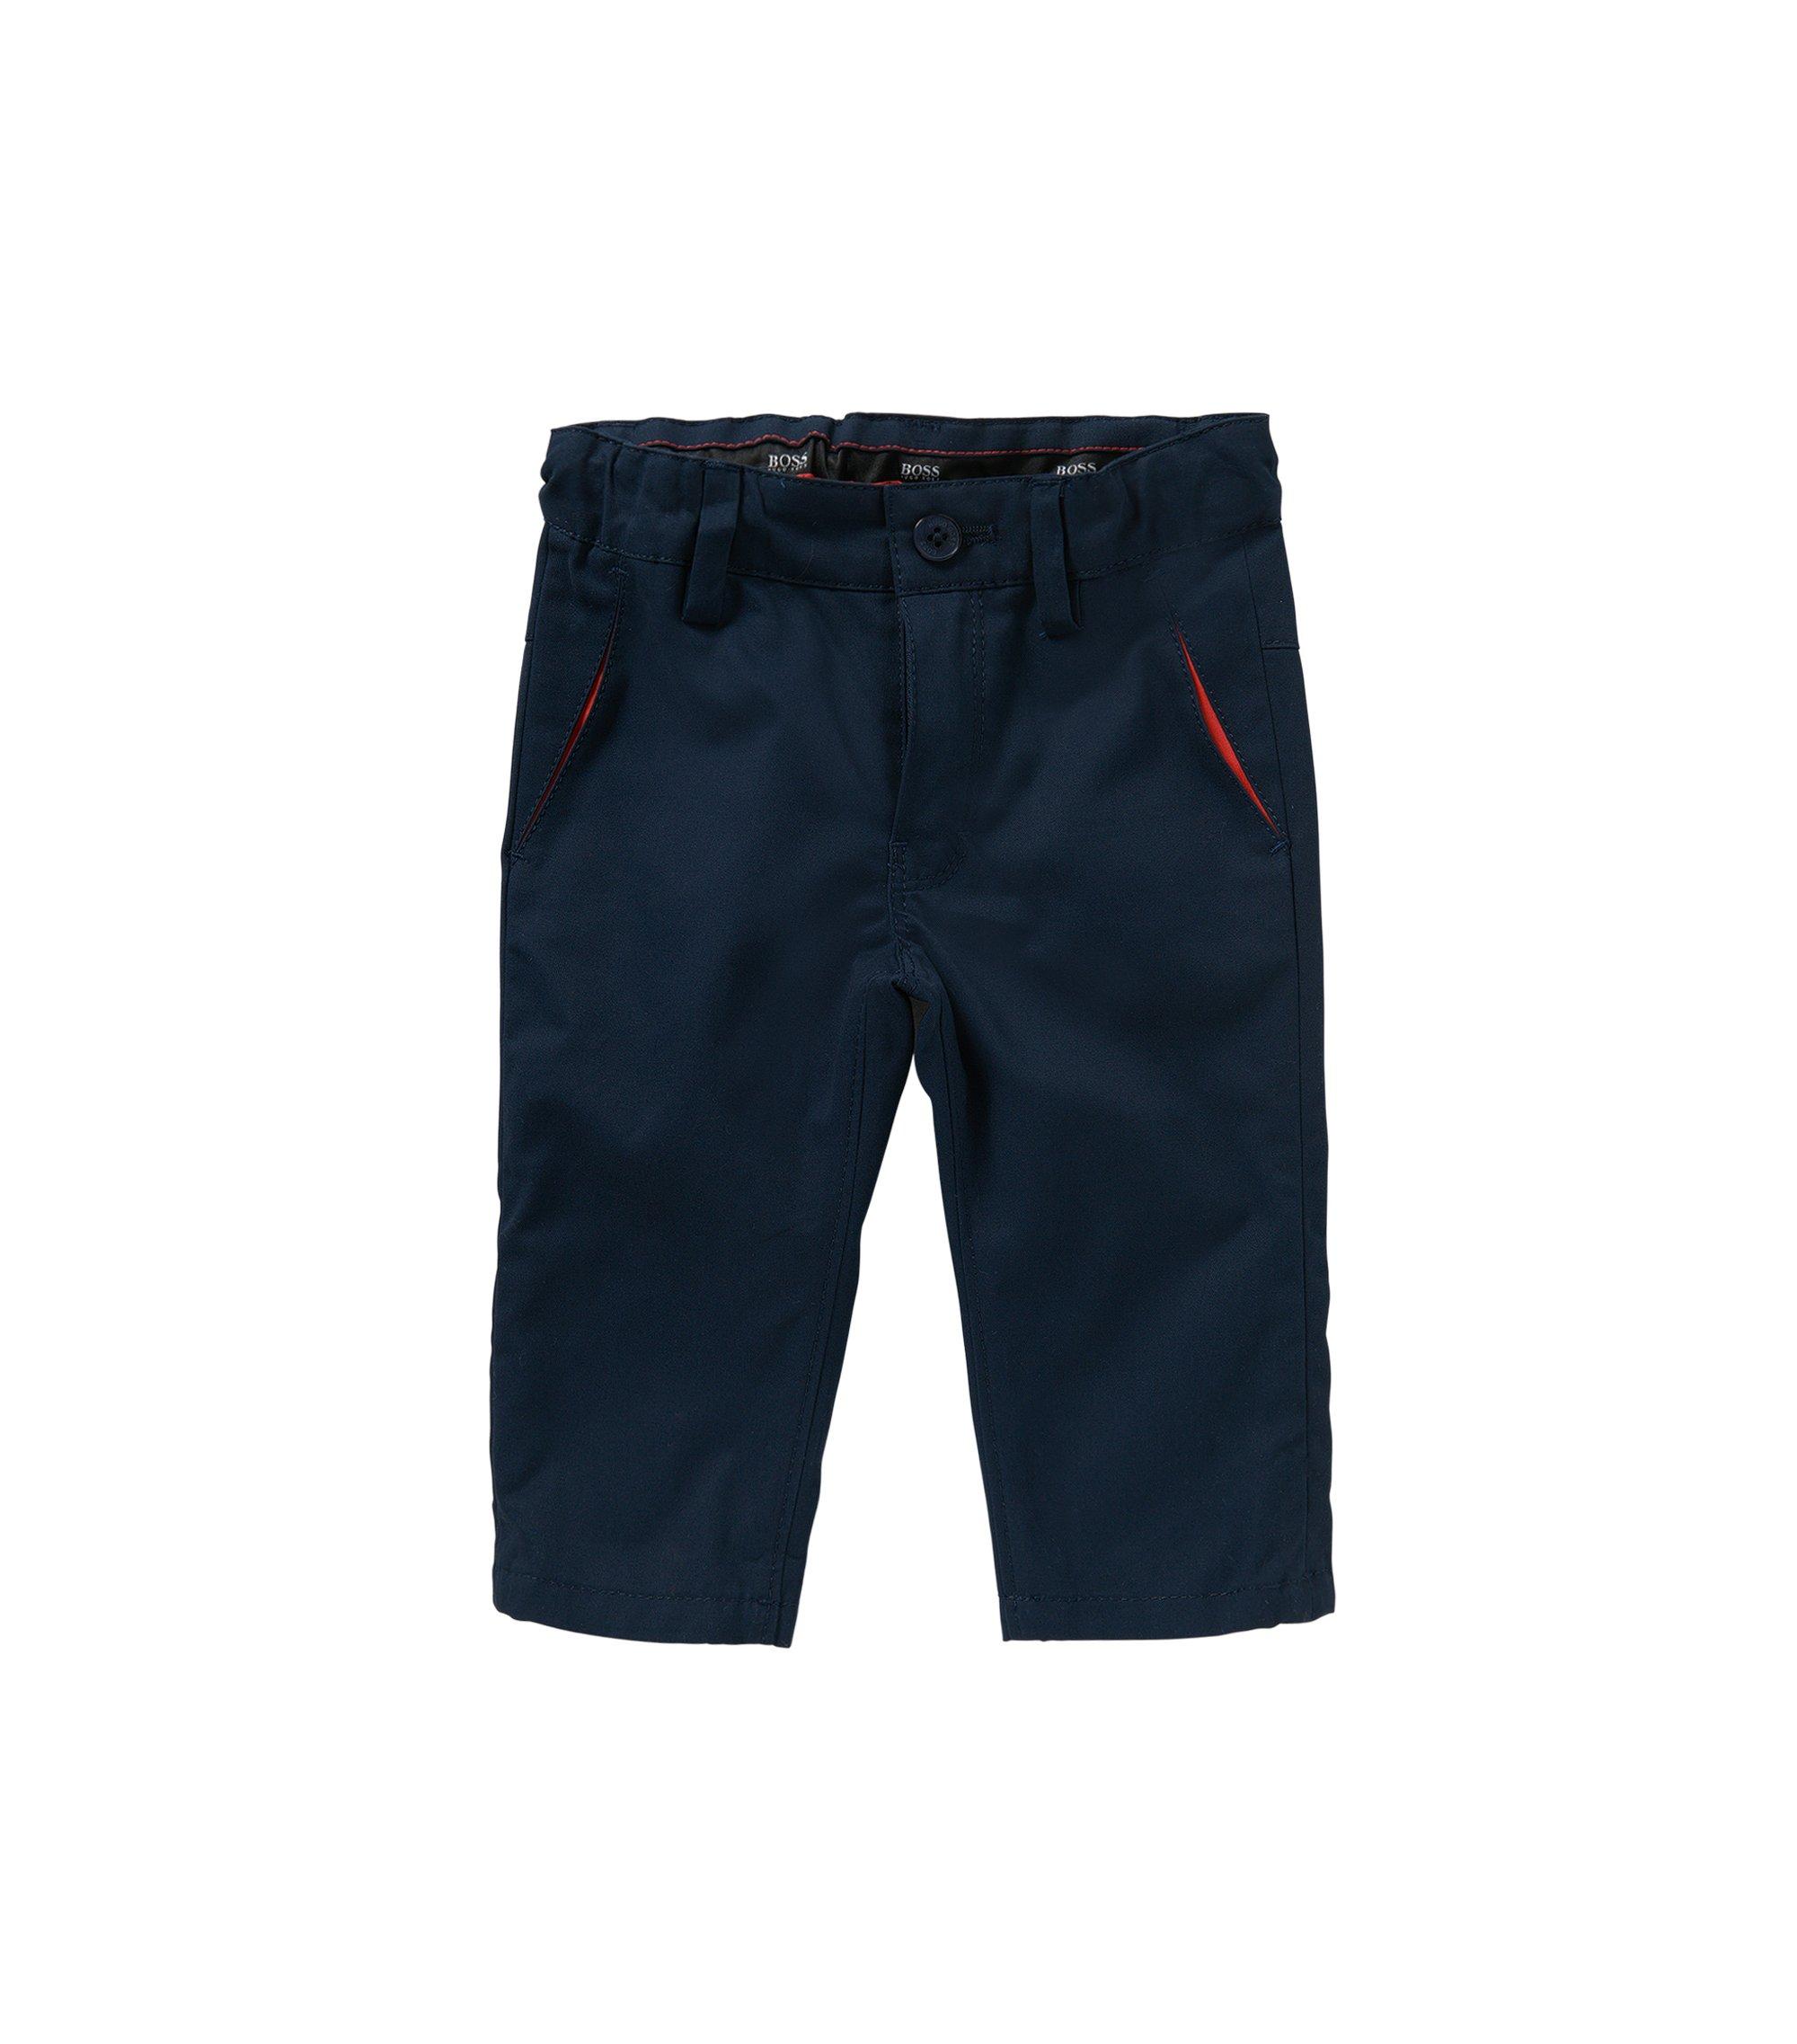 Regular-Fit Baby-Hose aus Baumwolle: 'J04227', Dunkelblau